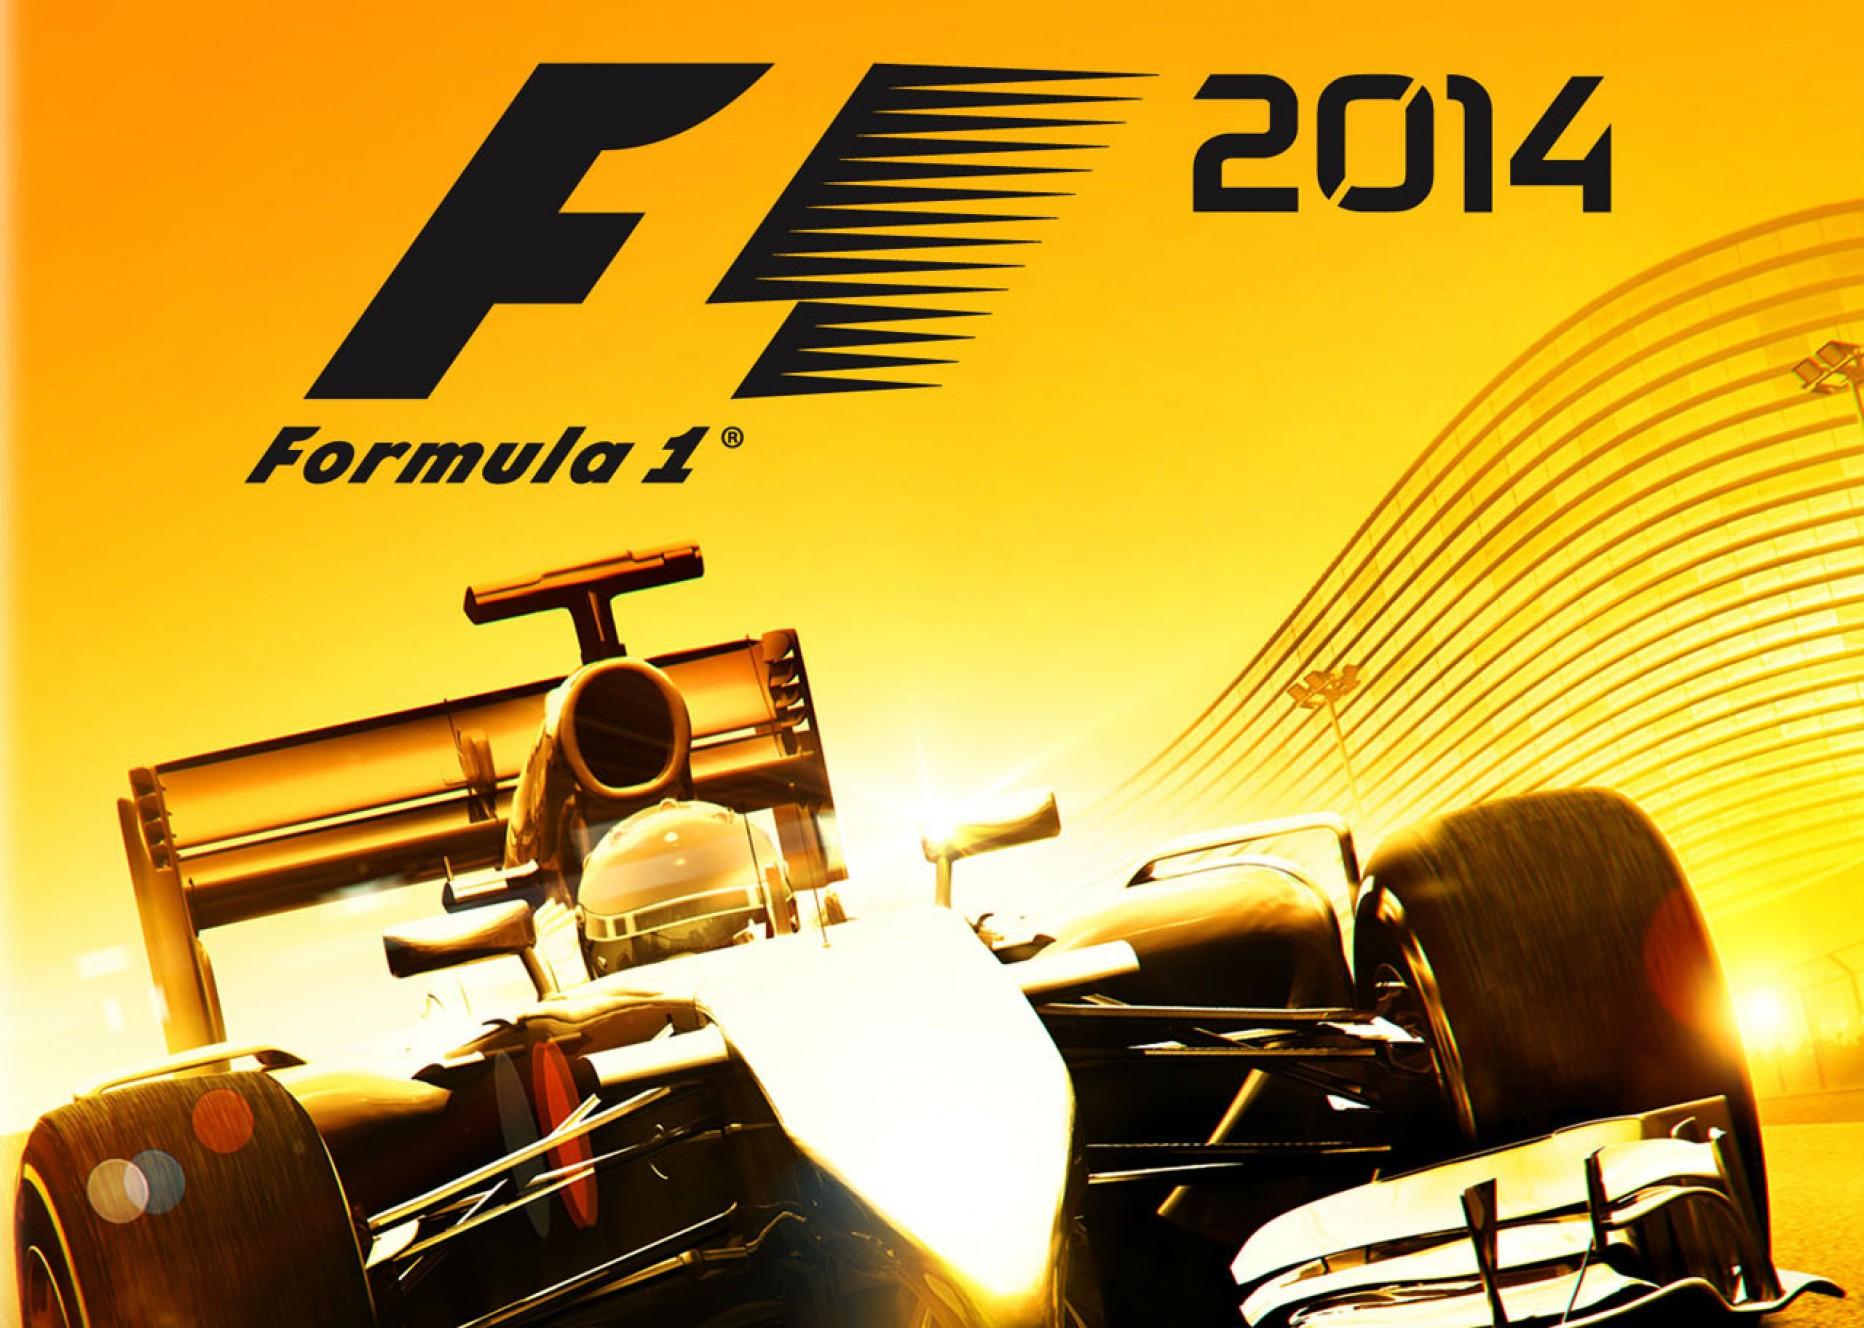 F1 2014 Ultimate Realism F1 2015 mod v1.0